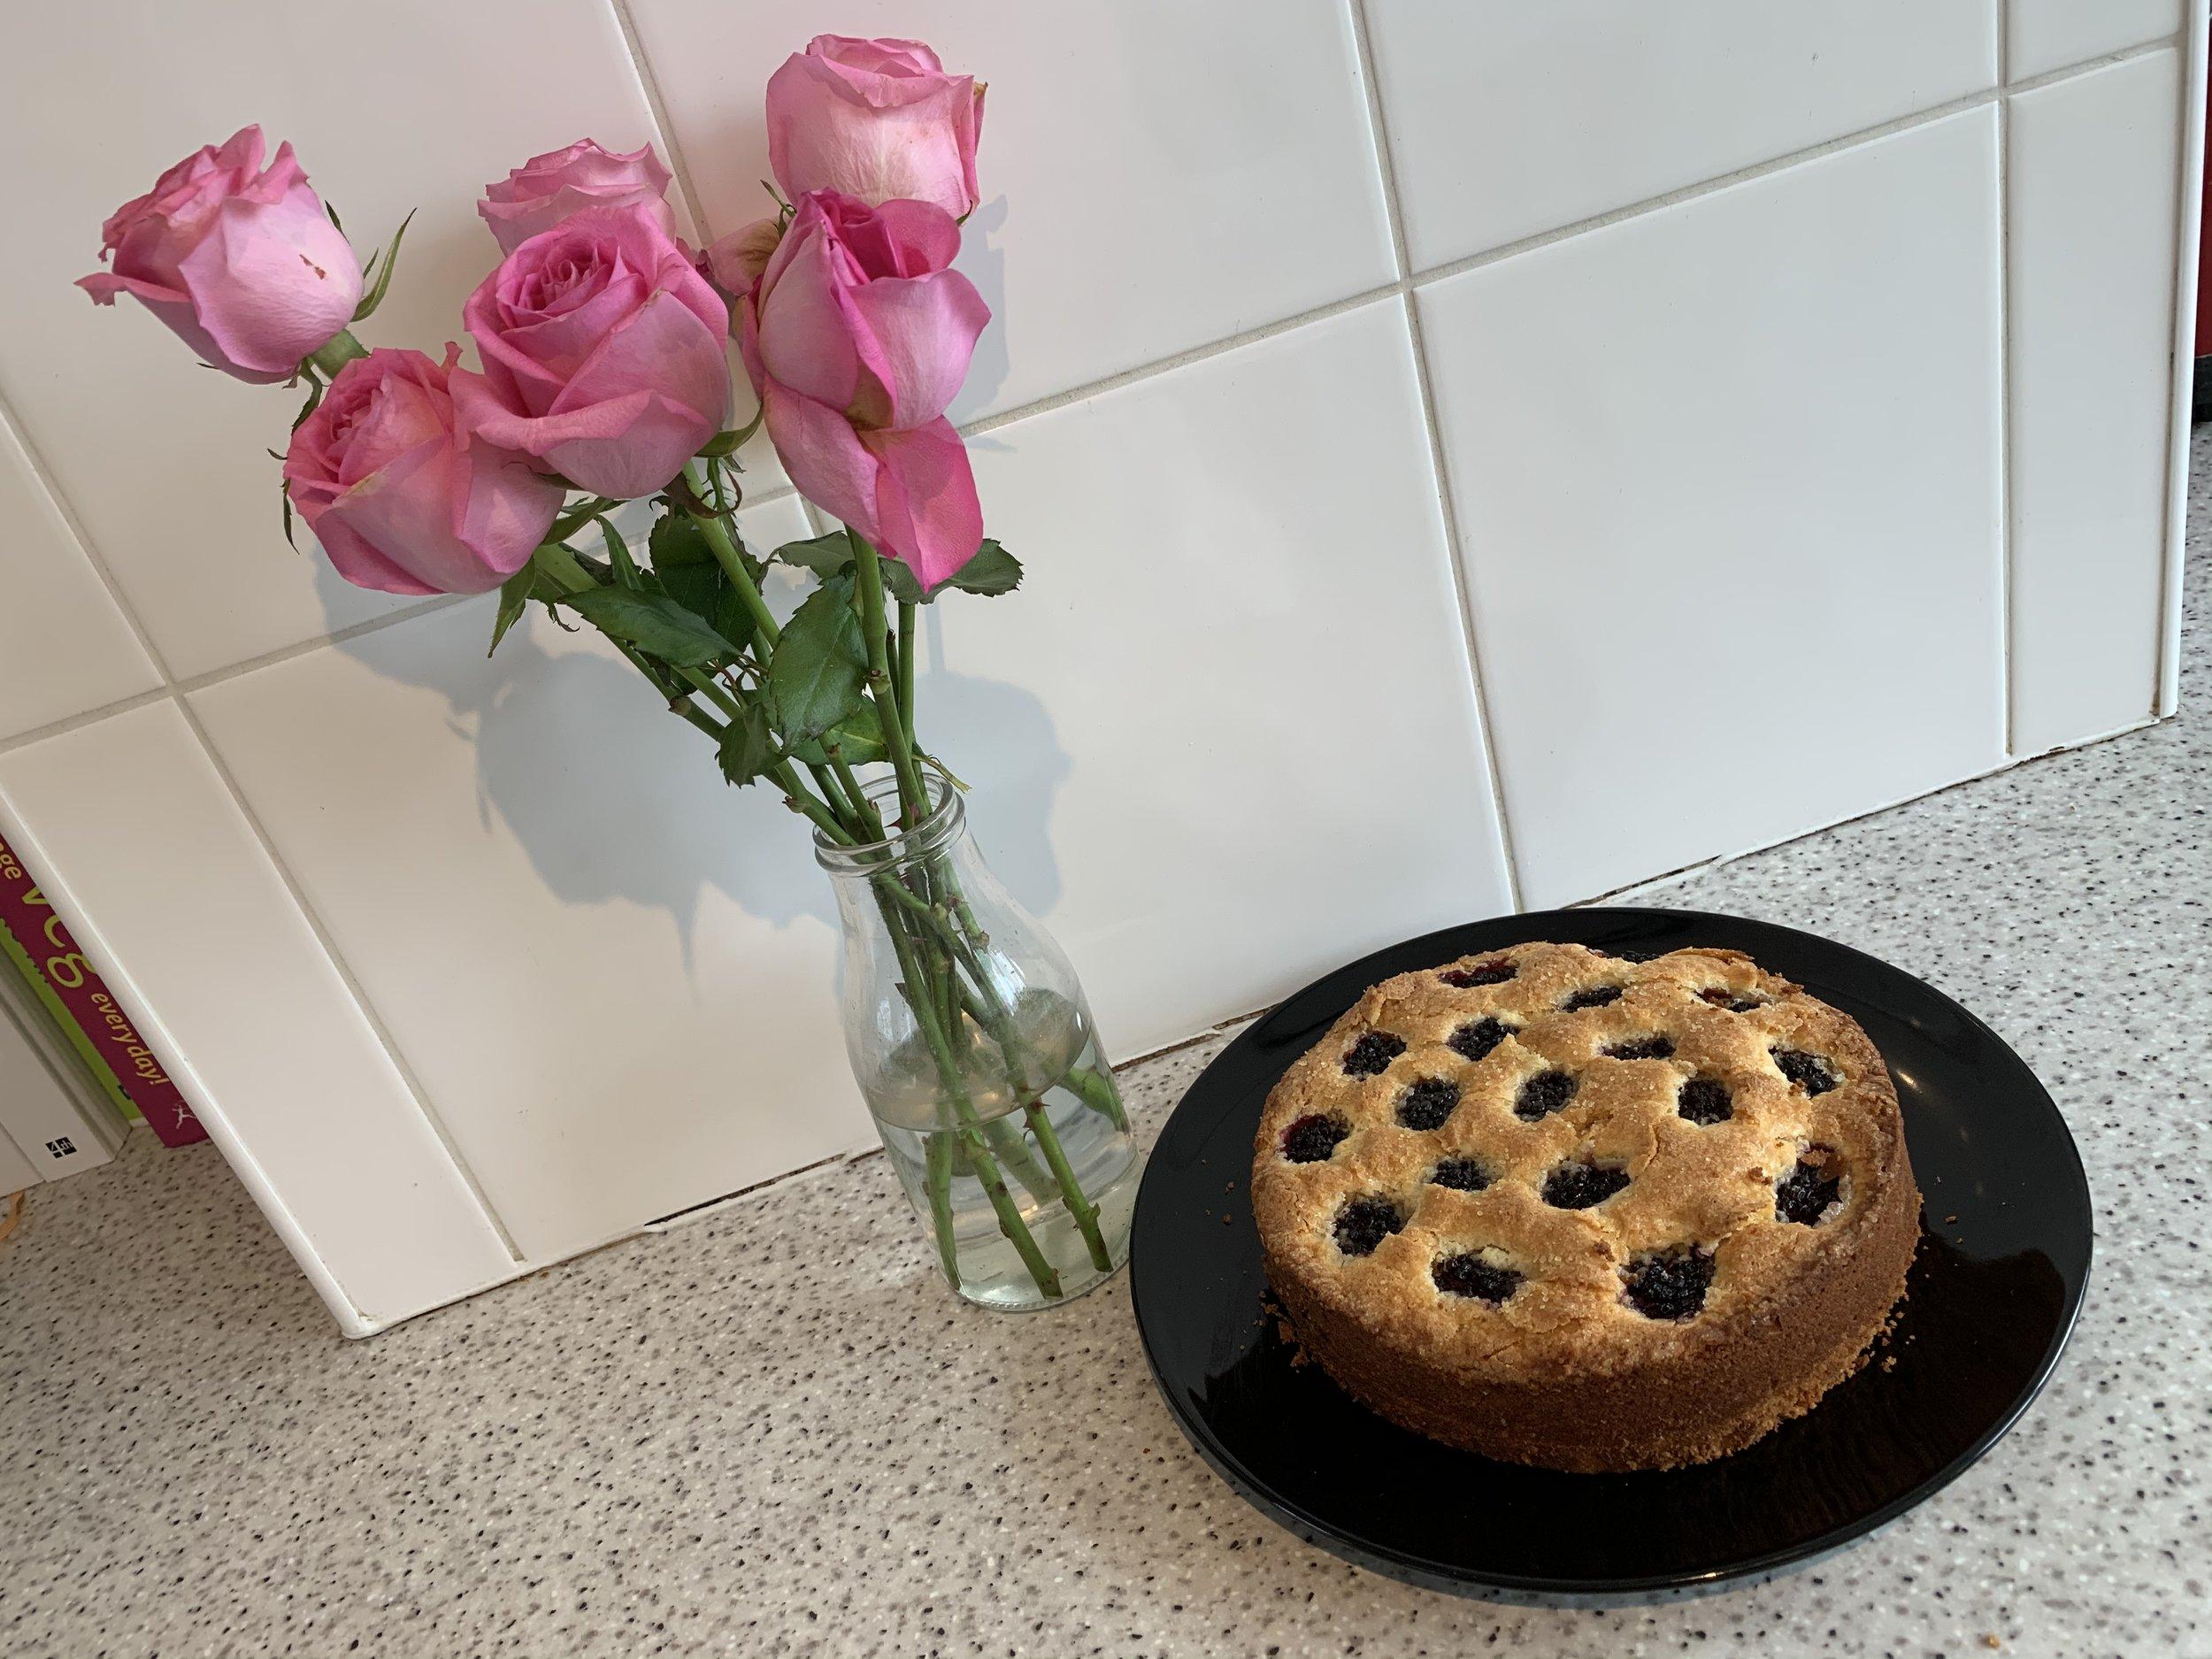 Blackberry and buttermilk sponge